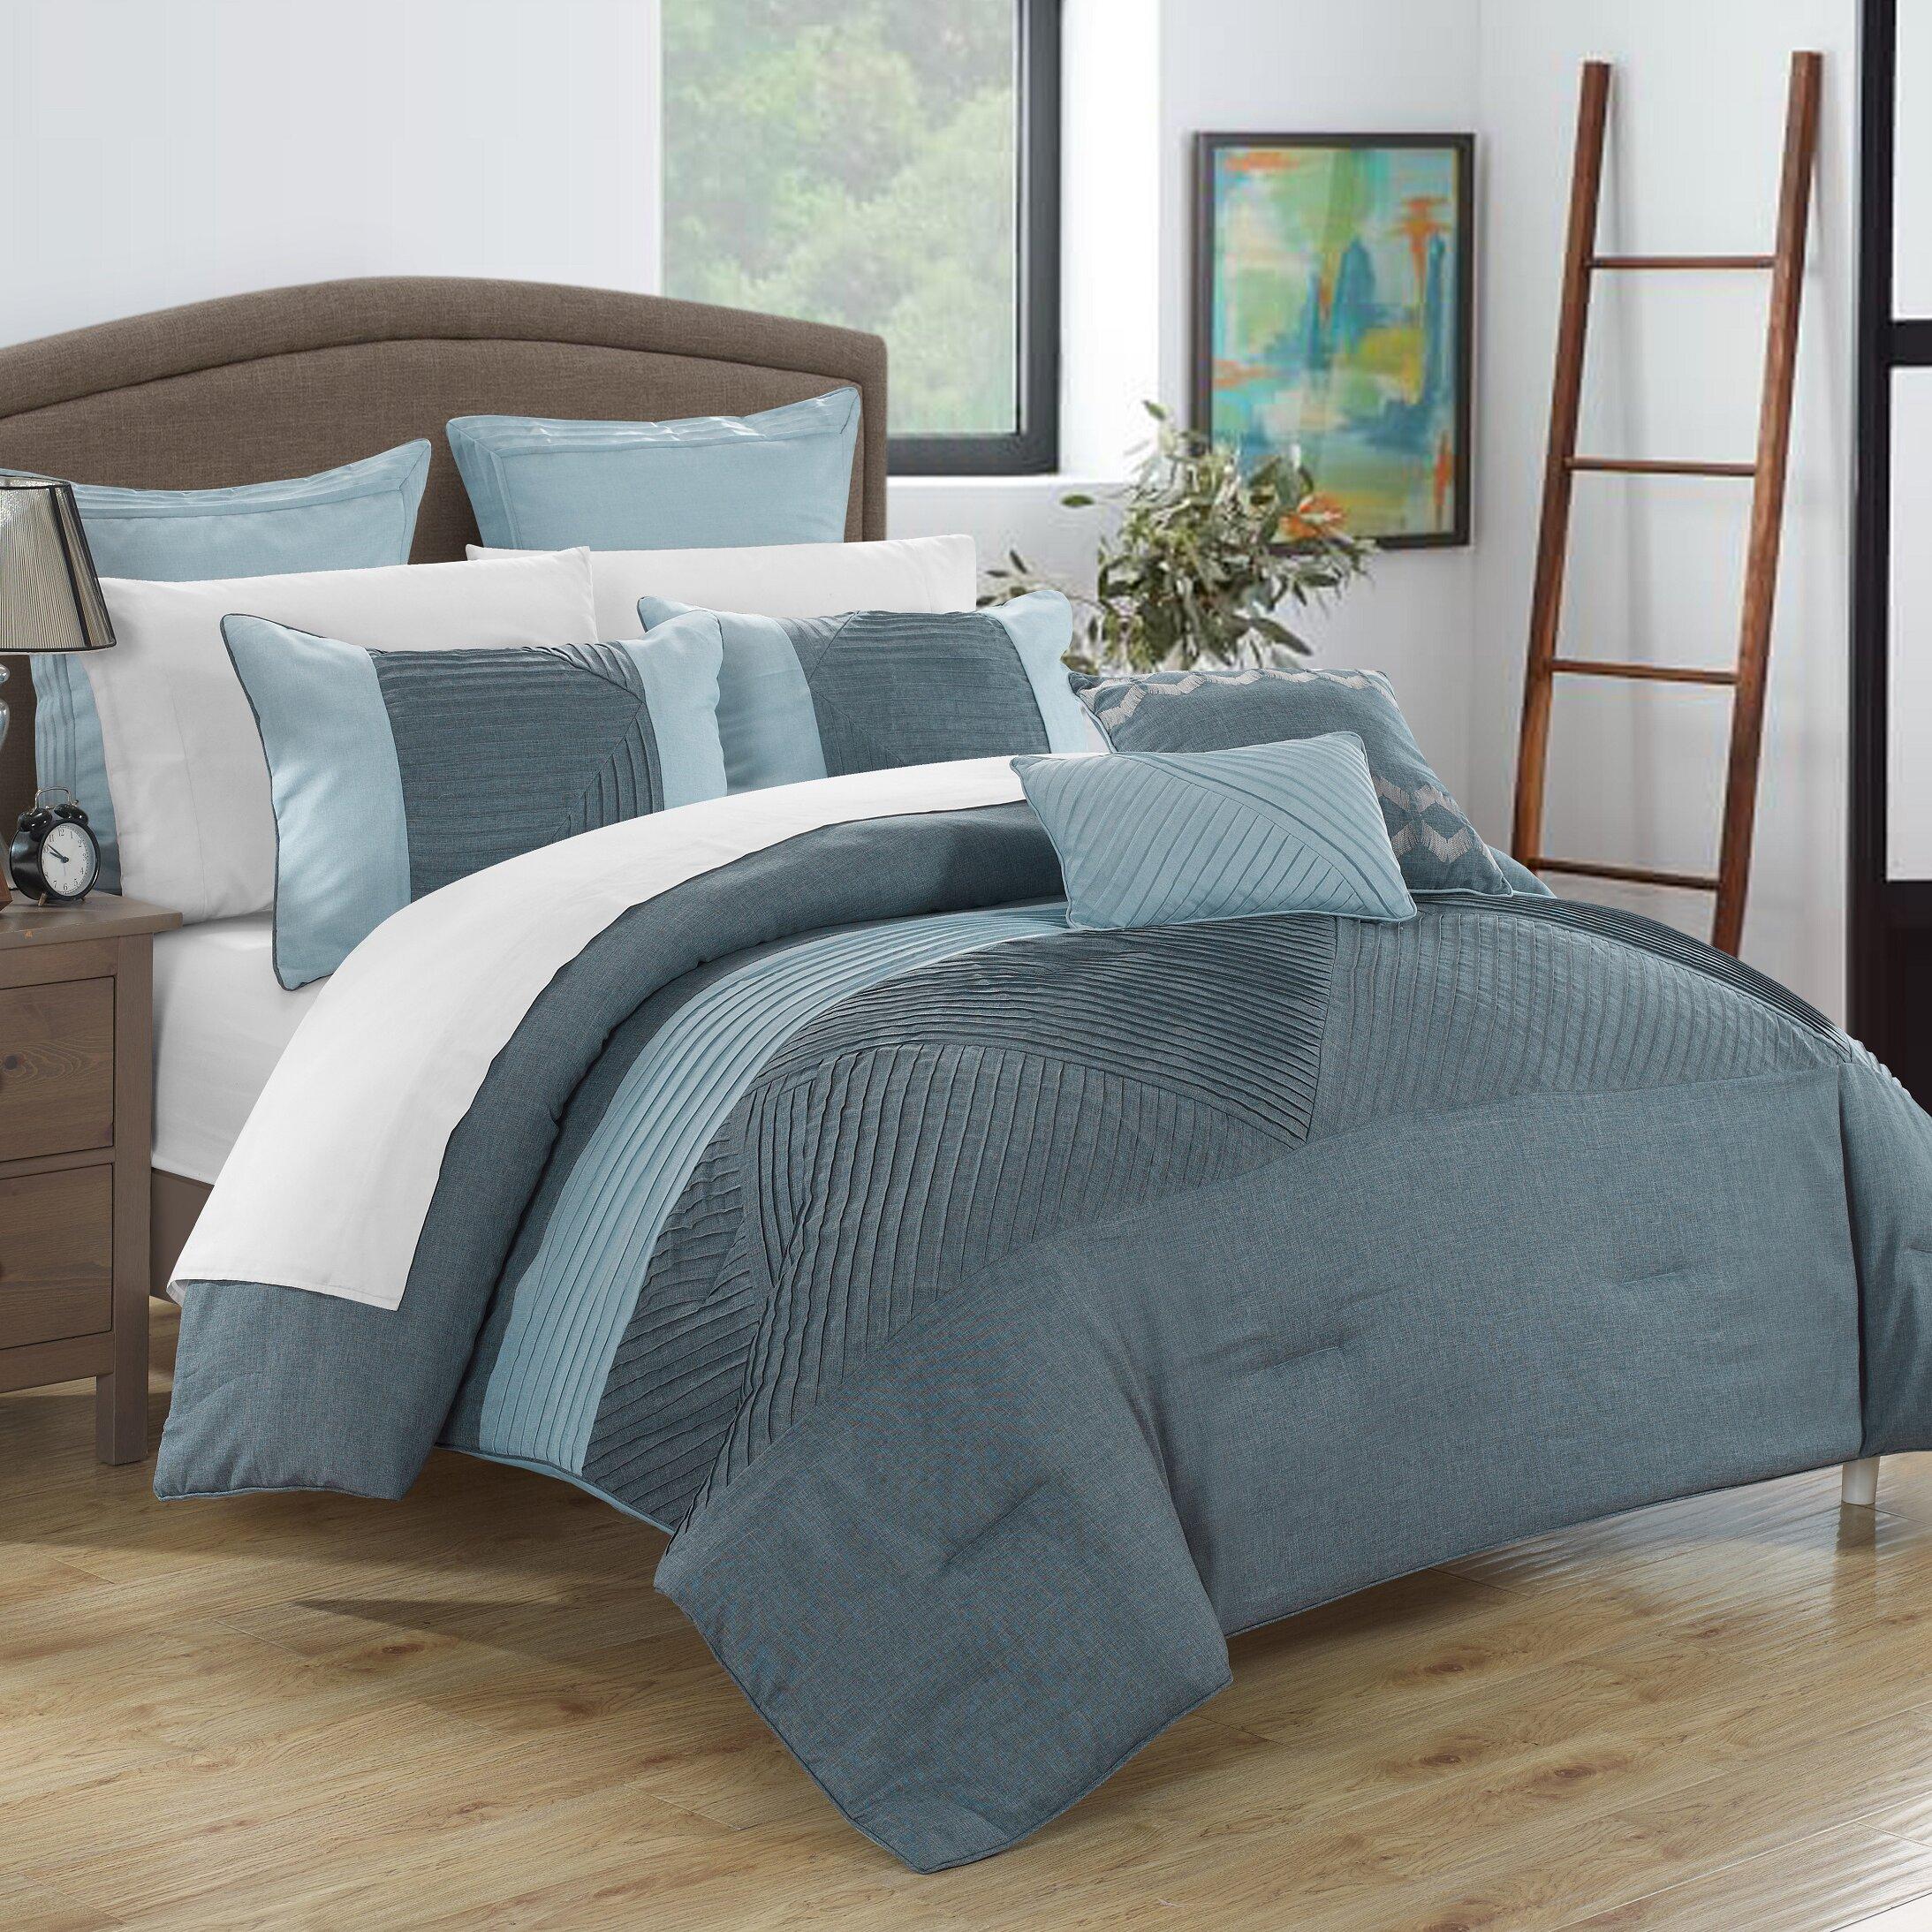 chic home marbella 11 piece comforter set  reviews  wayfair